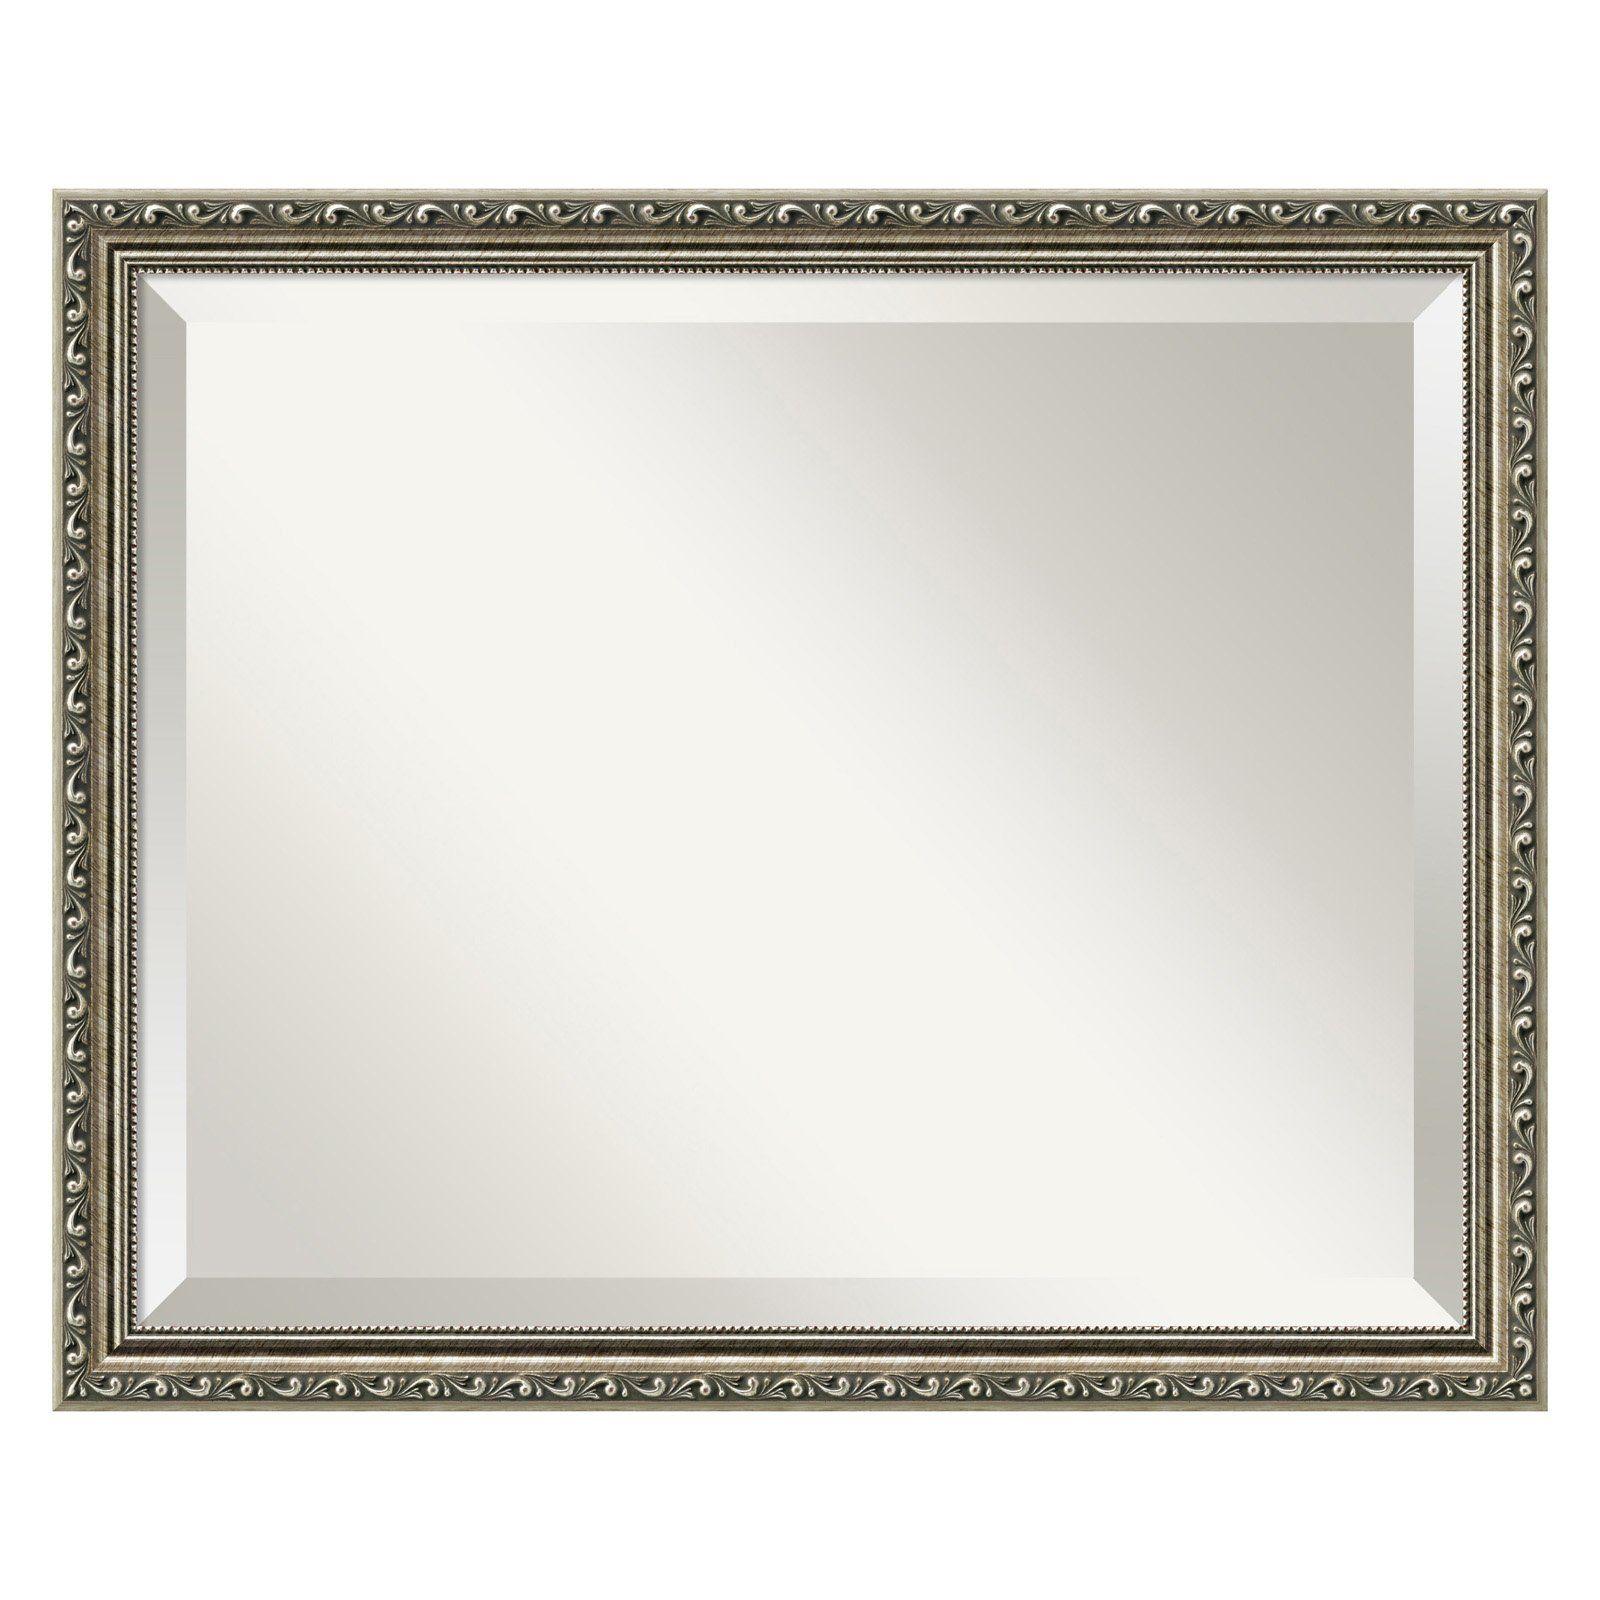 Have to have it. Parisian Silver Wall Mirror - 22W x 18H in. - $109.95 @hayneedle.com